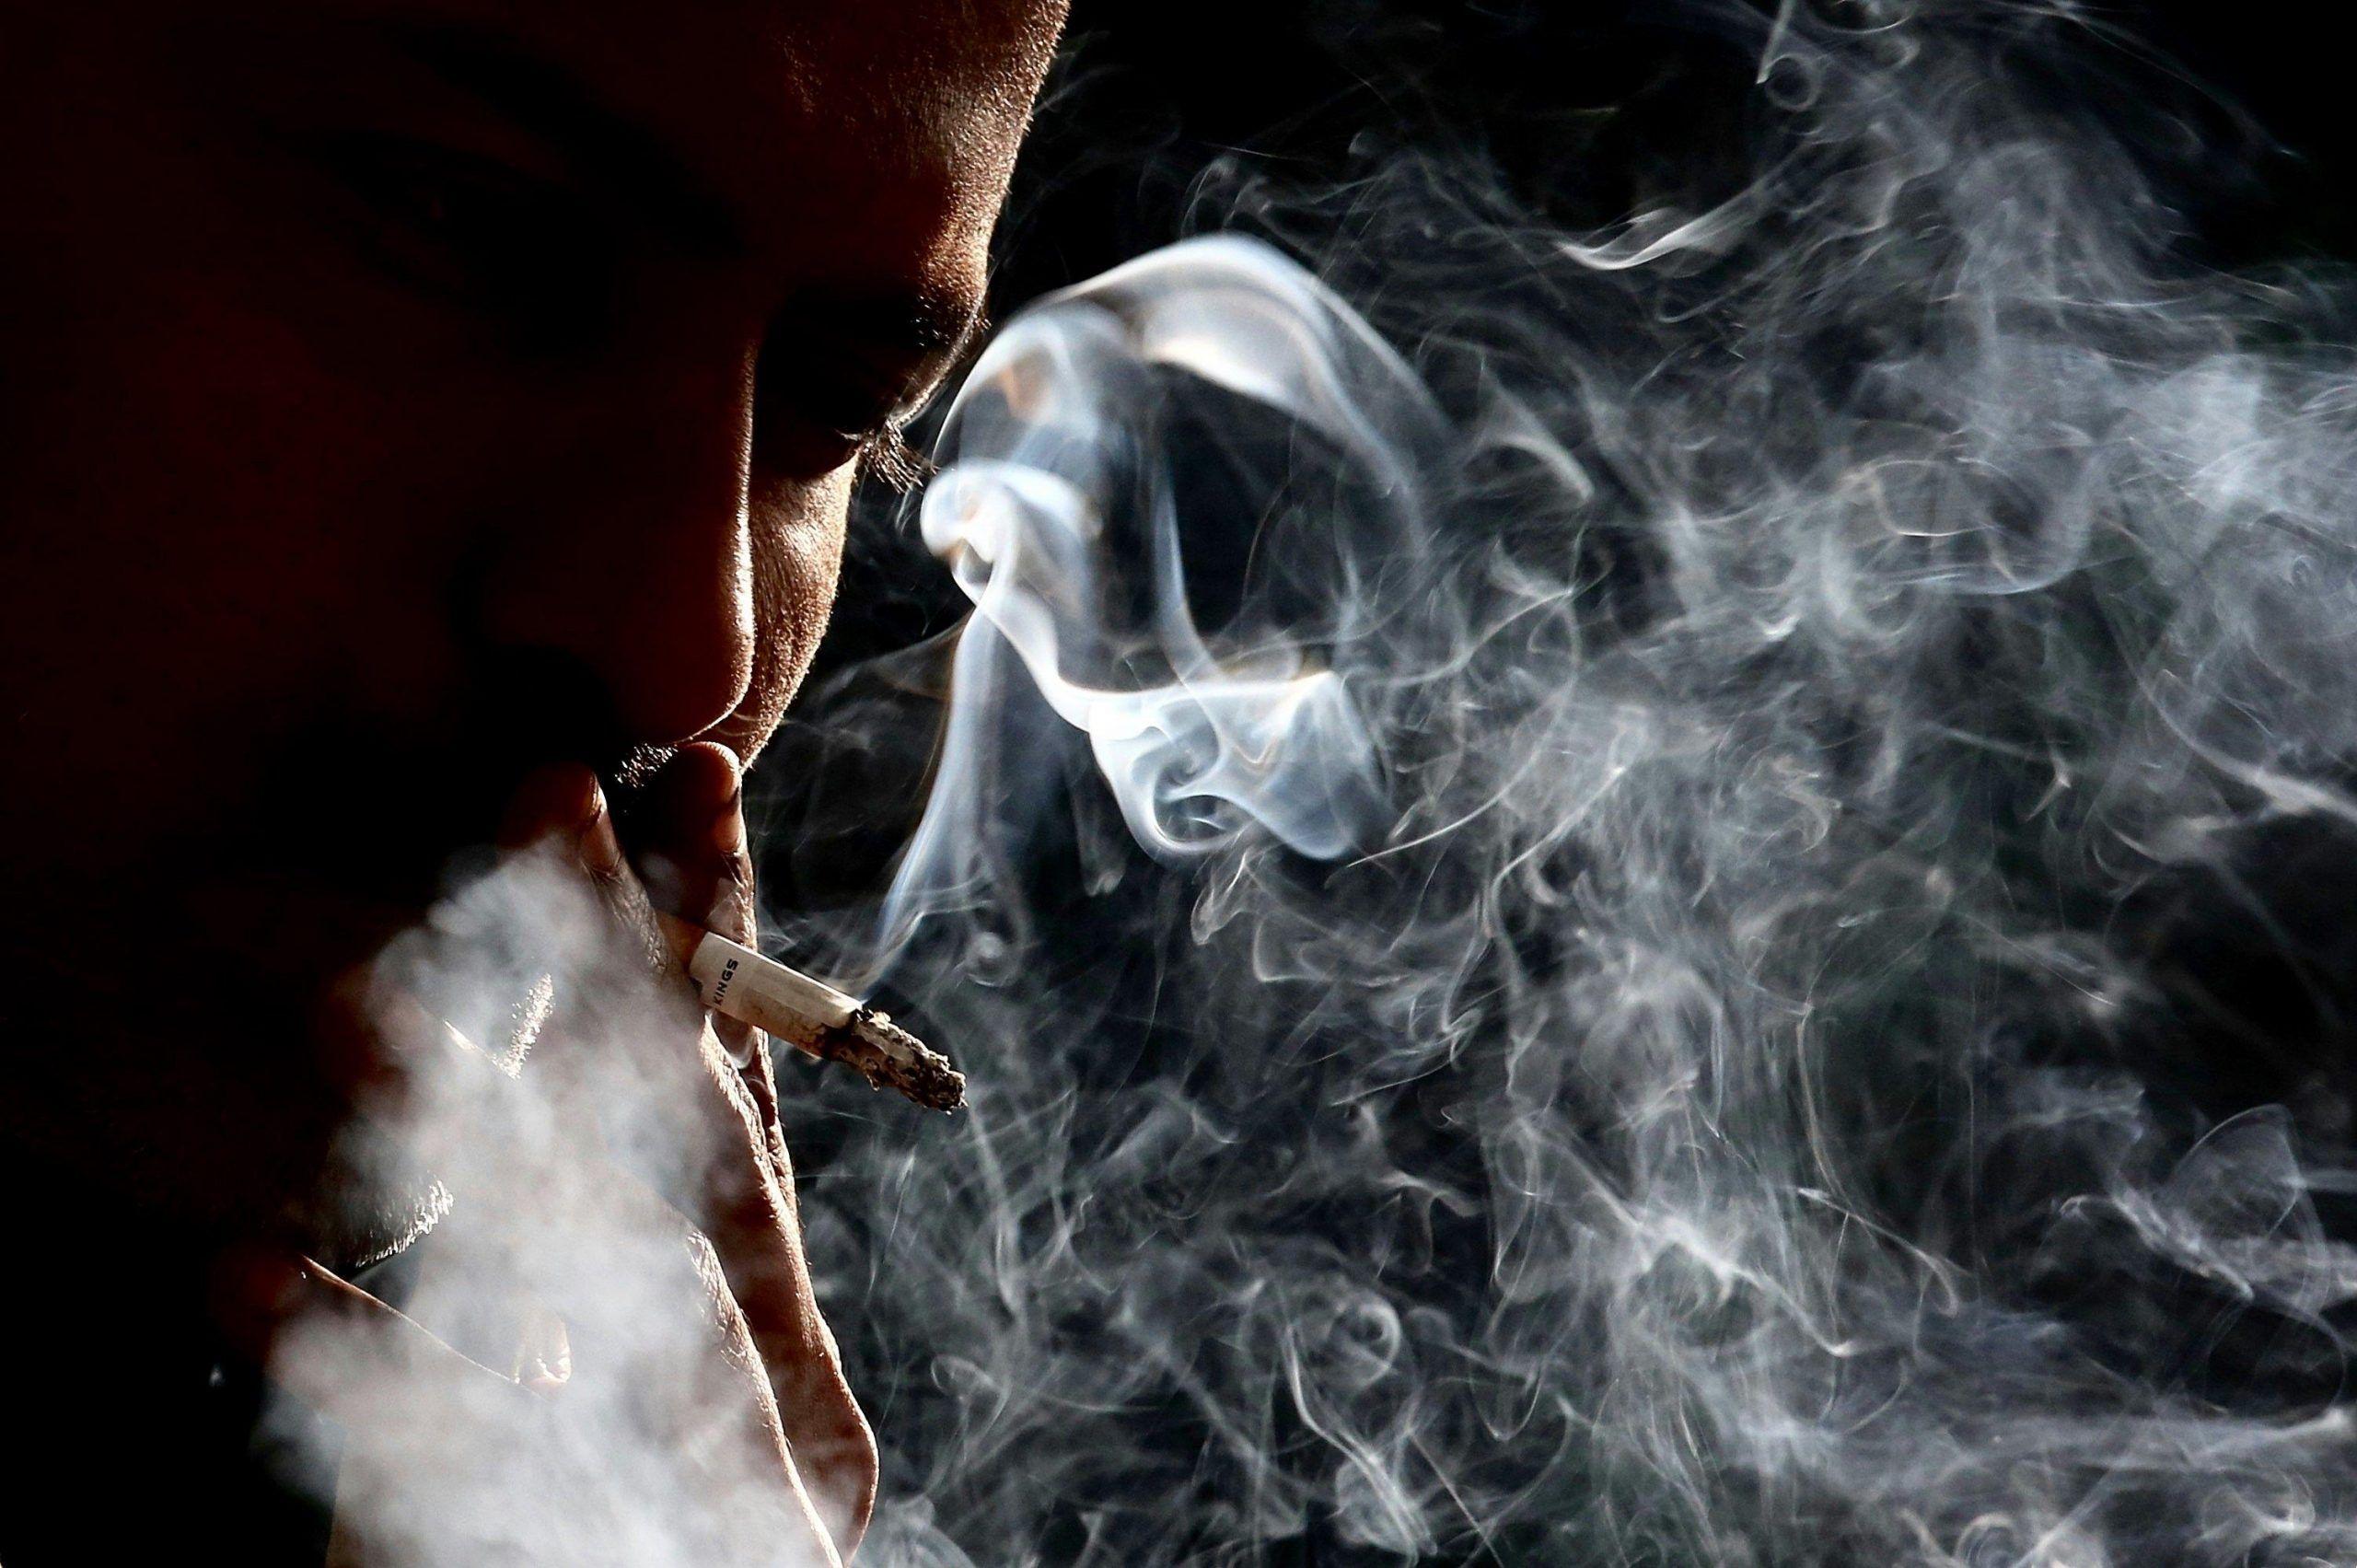 World No Tobacco Day in India